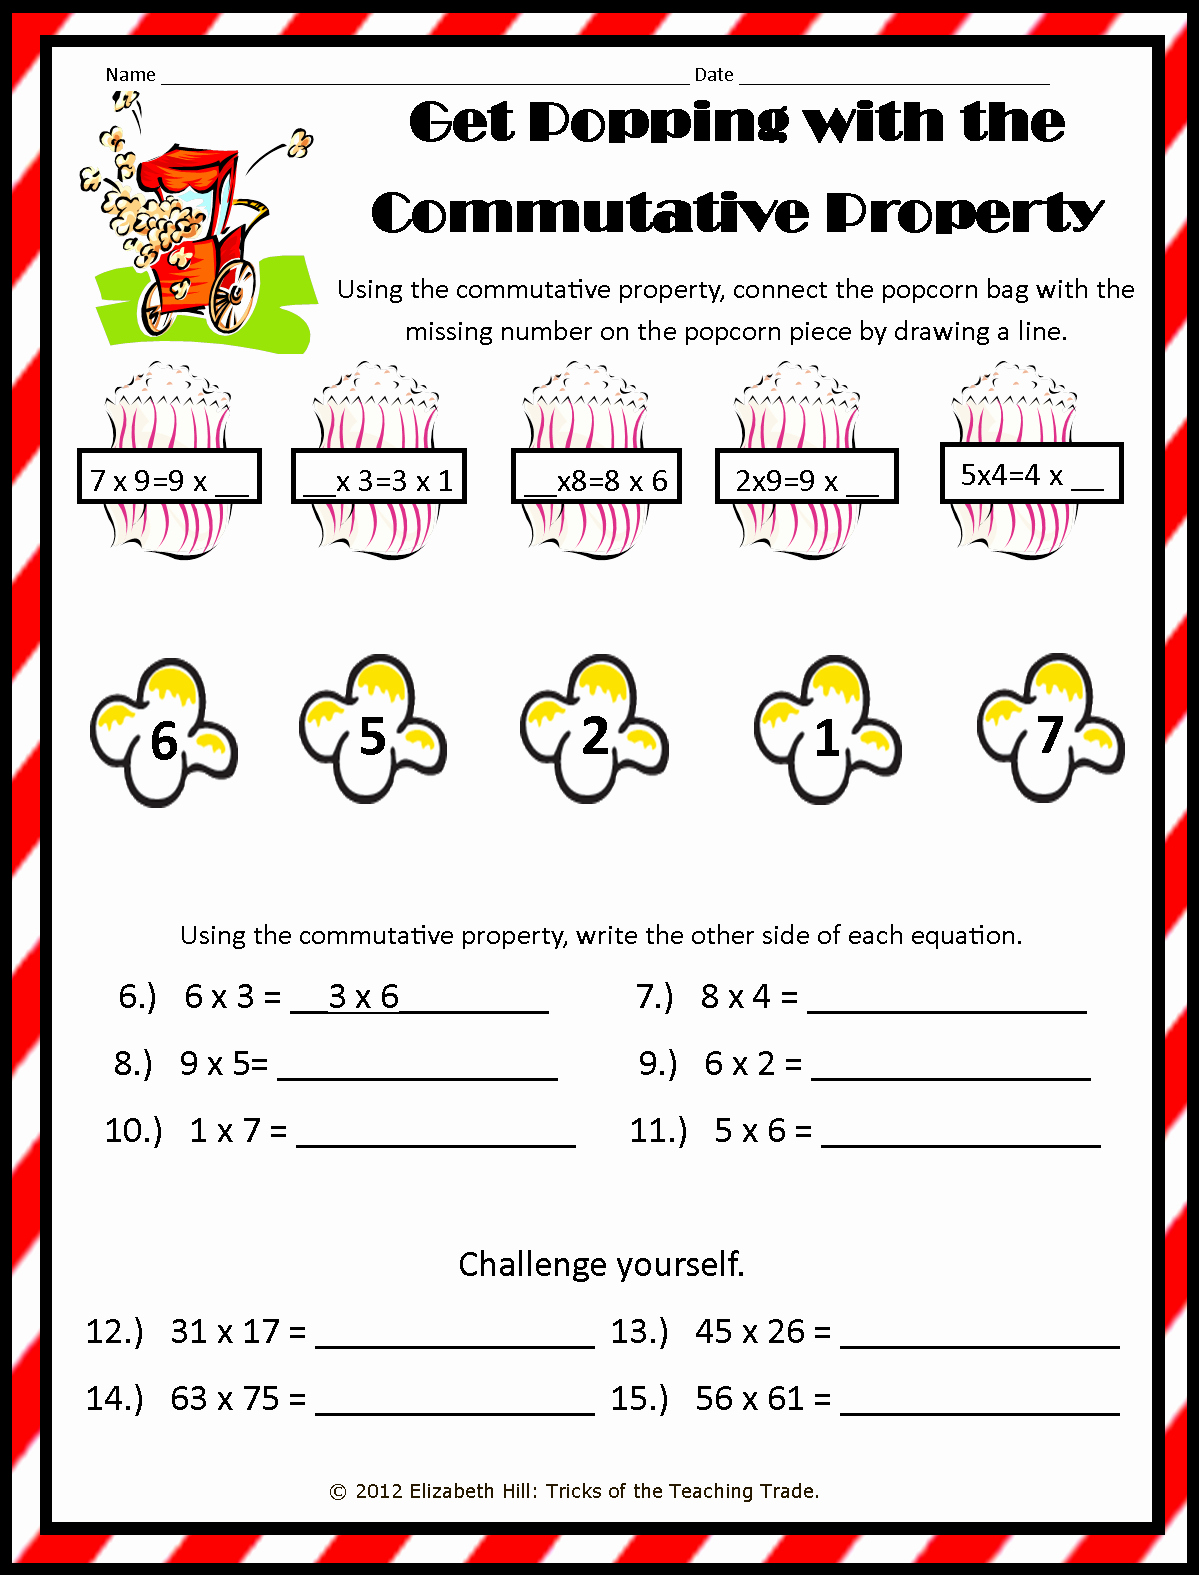 3rd Grade Distributive Property Worksheets Beautiful Mutative Property Addition Worksheets for 3rd Grade